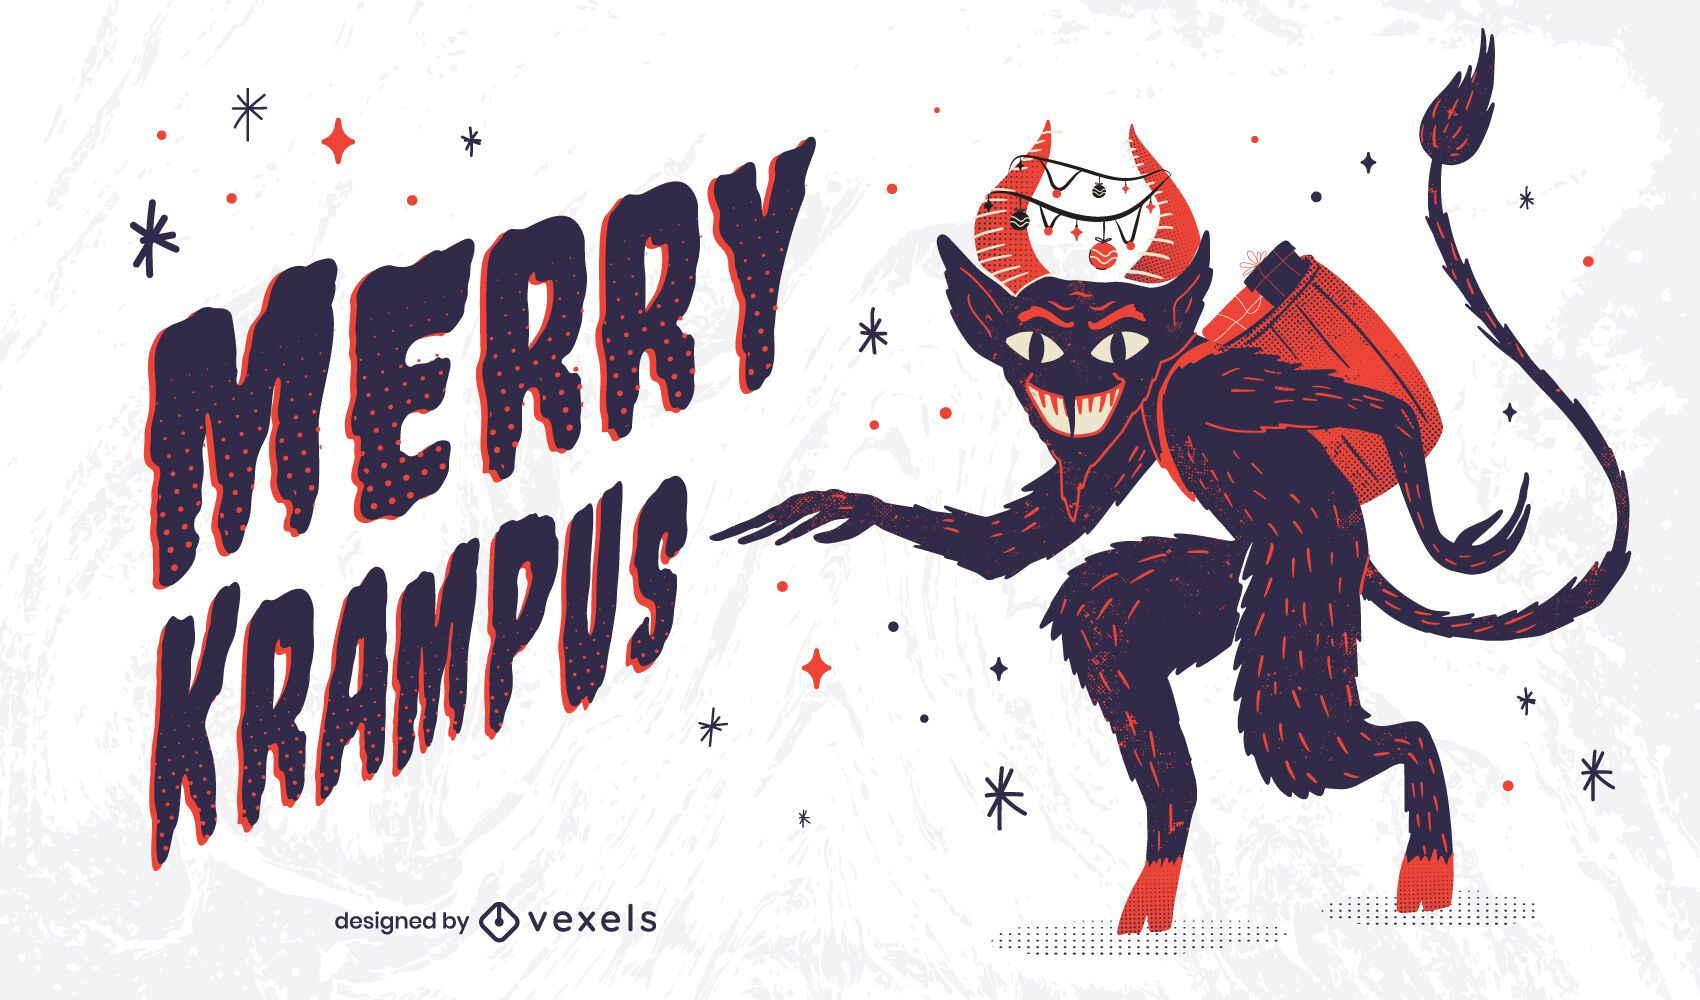 Merry krampus illustration design